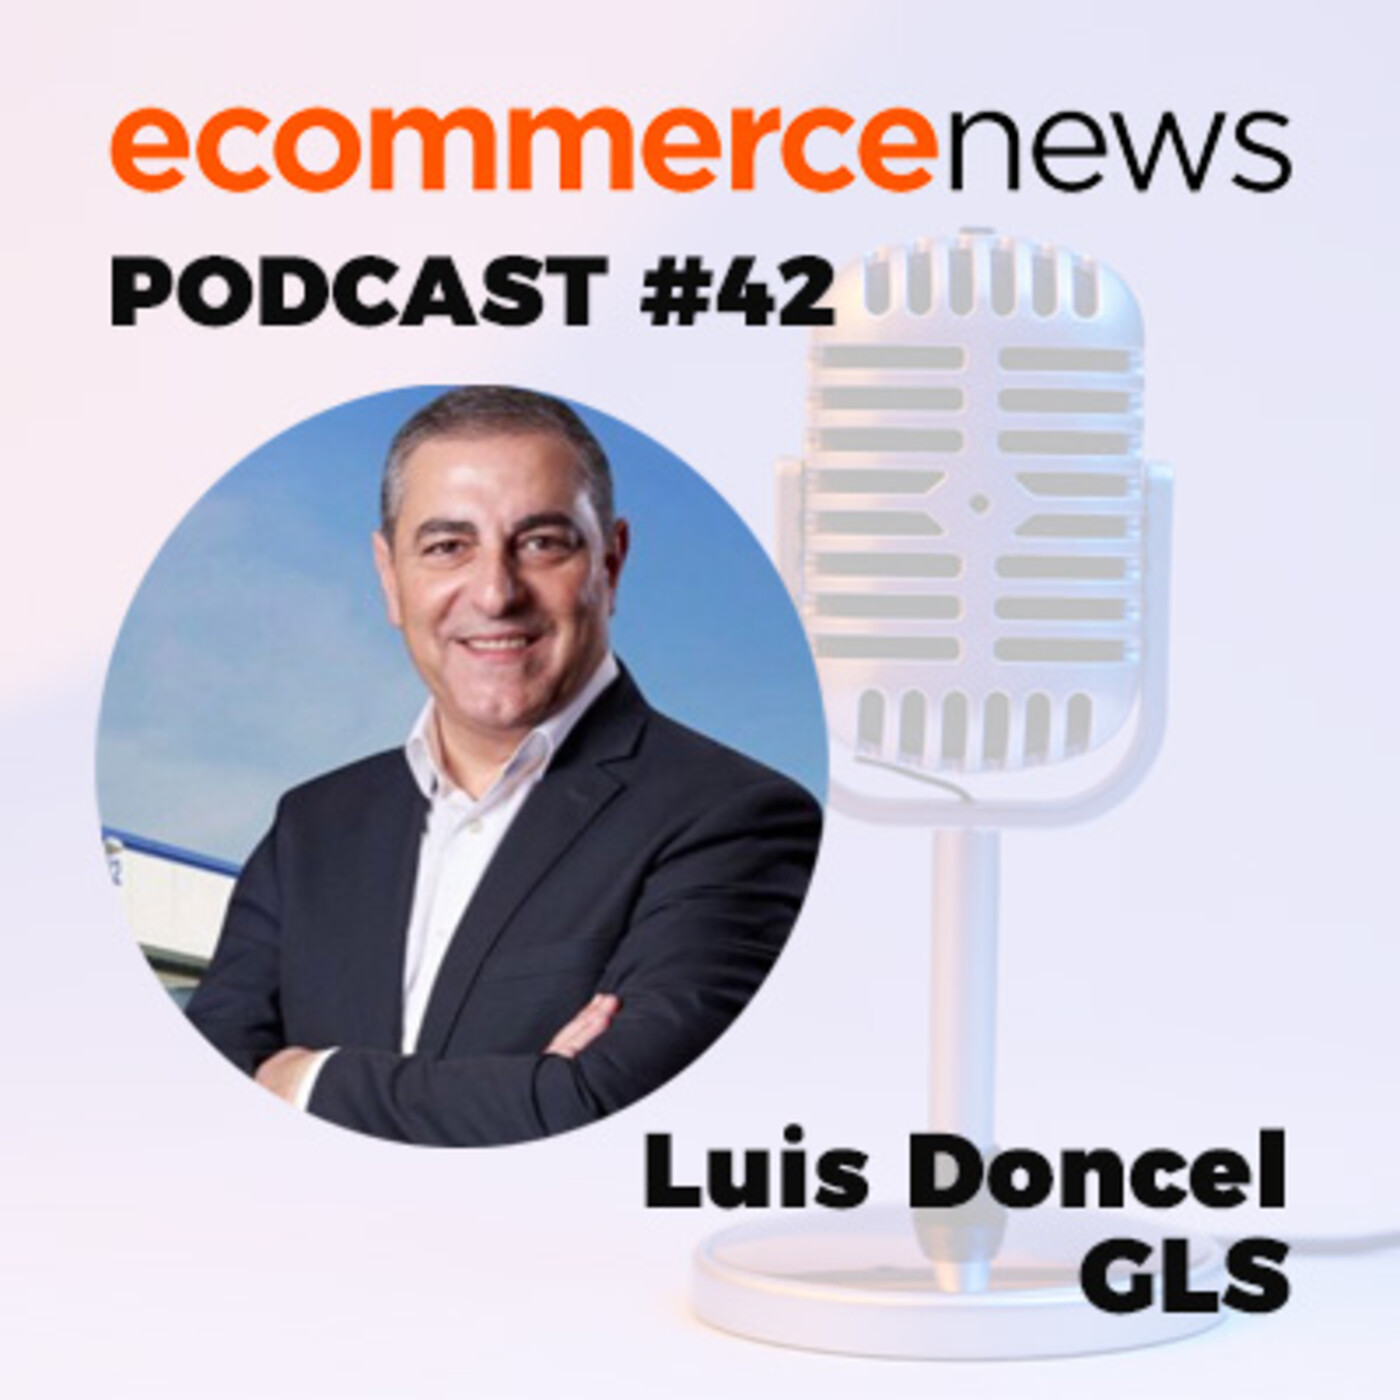 Ecommerce News Radio #43. Luis Doncel, General Manager de GLS